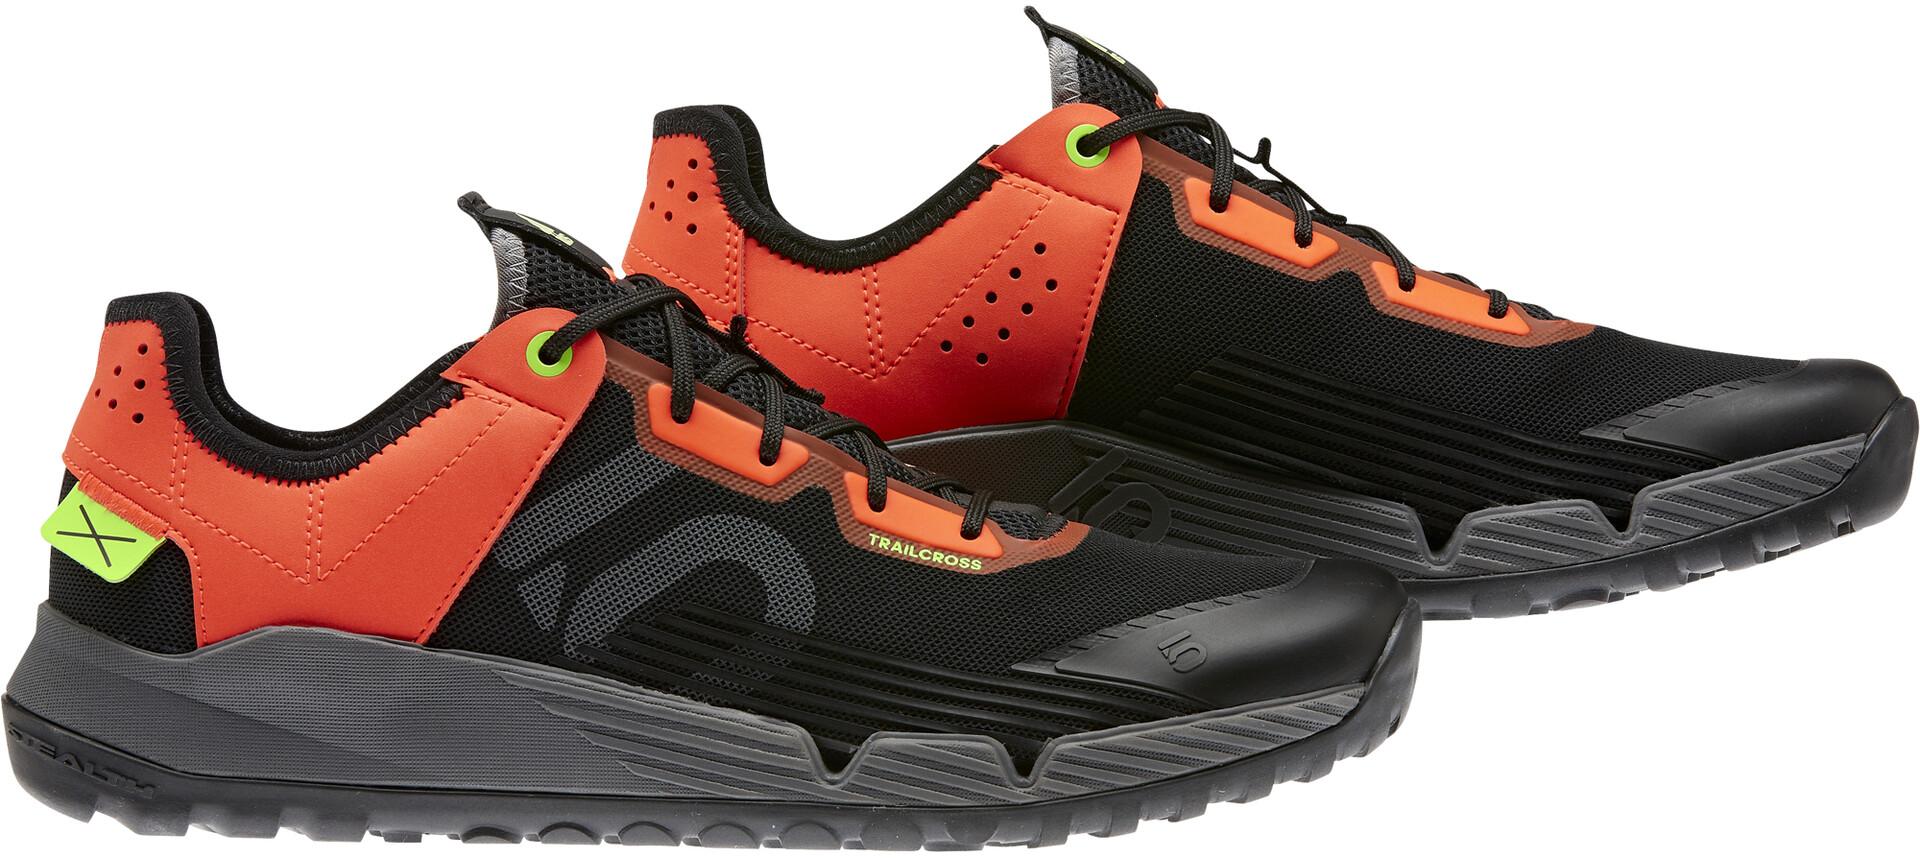 adidas Five Ten Trailcross LT Scarpe Per Mountain Bike Uomo, core blackgrey threesolid red